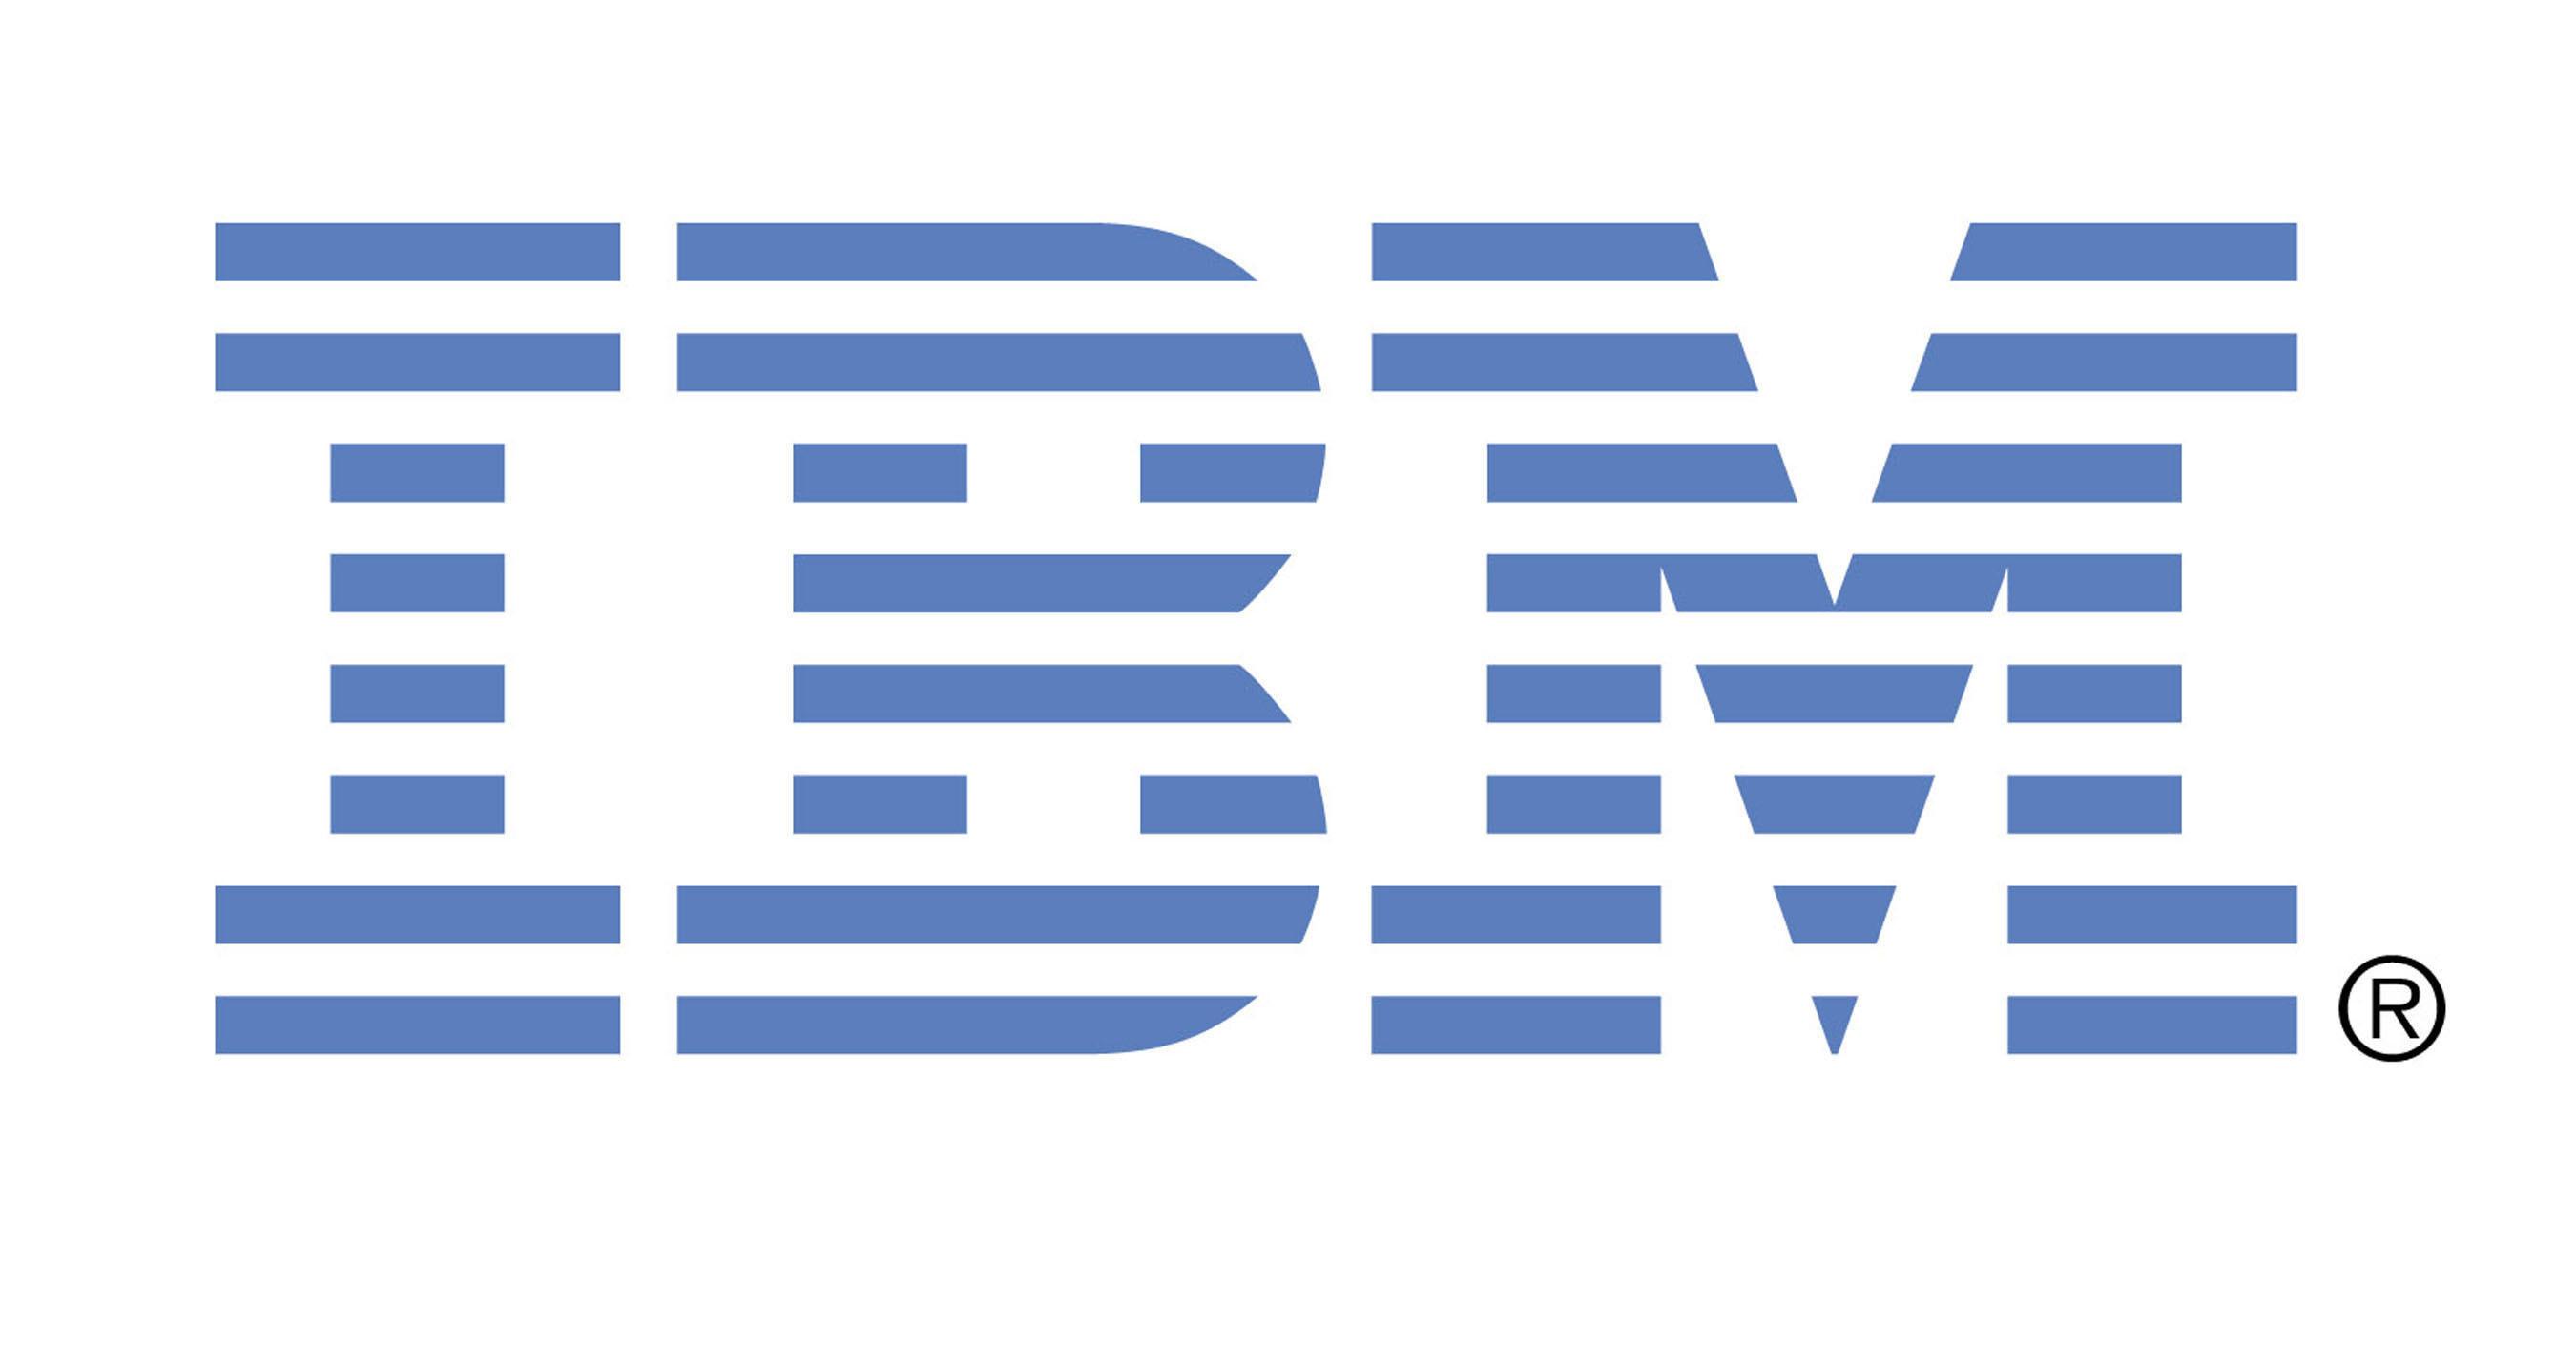 IBM Boosts zEnterprise Mainframe Portfolio to Help Clients Build Better Customer Experiences